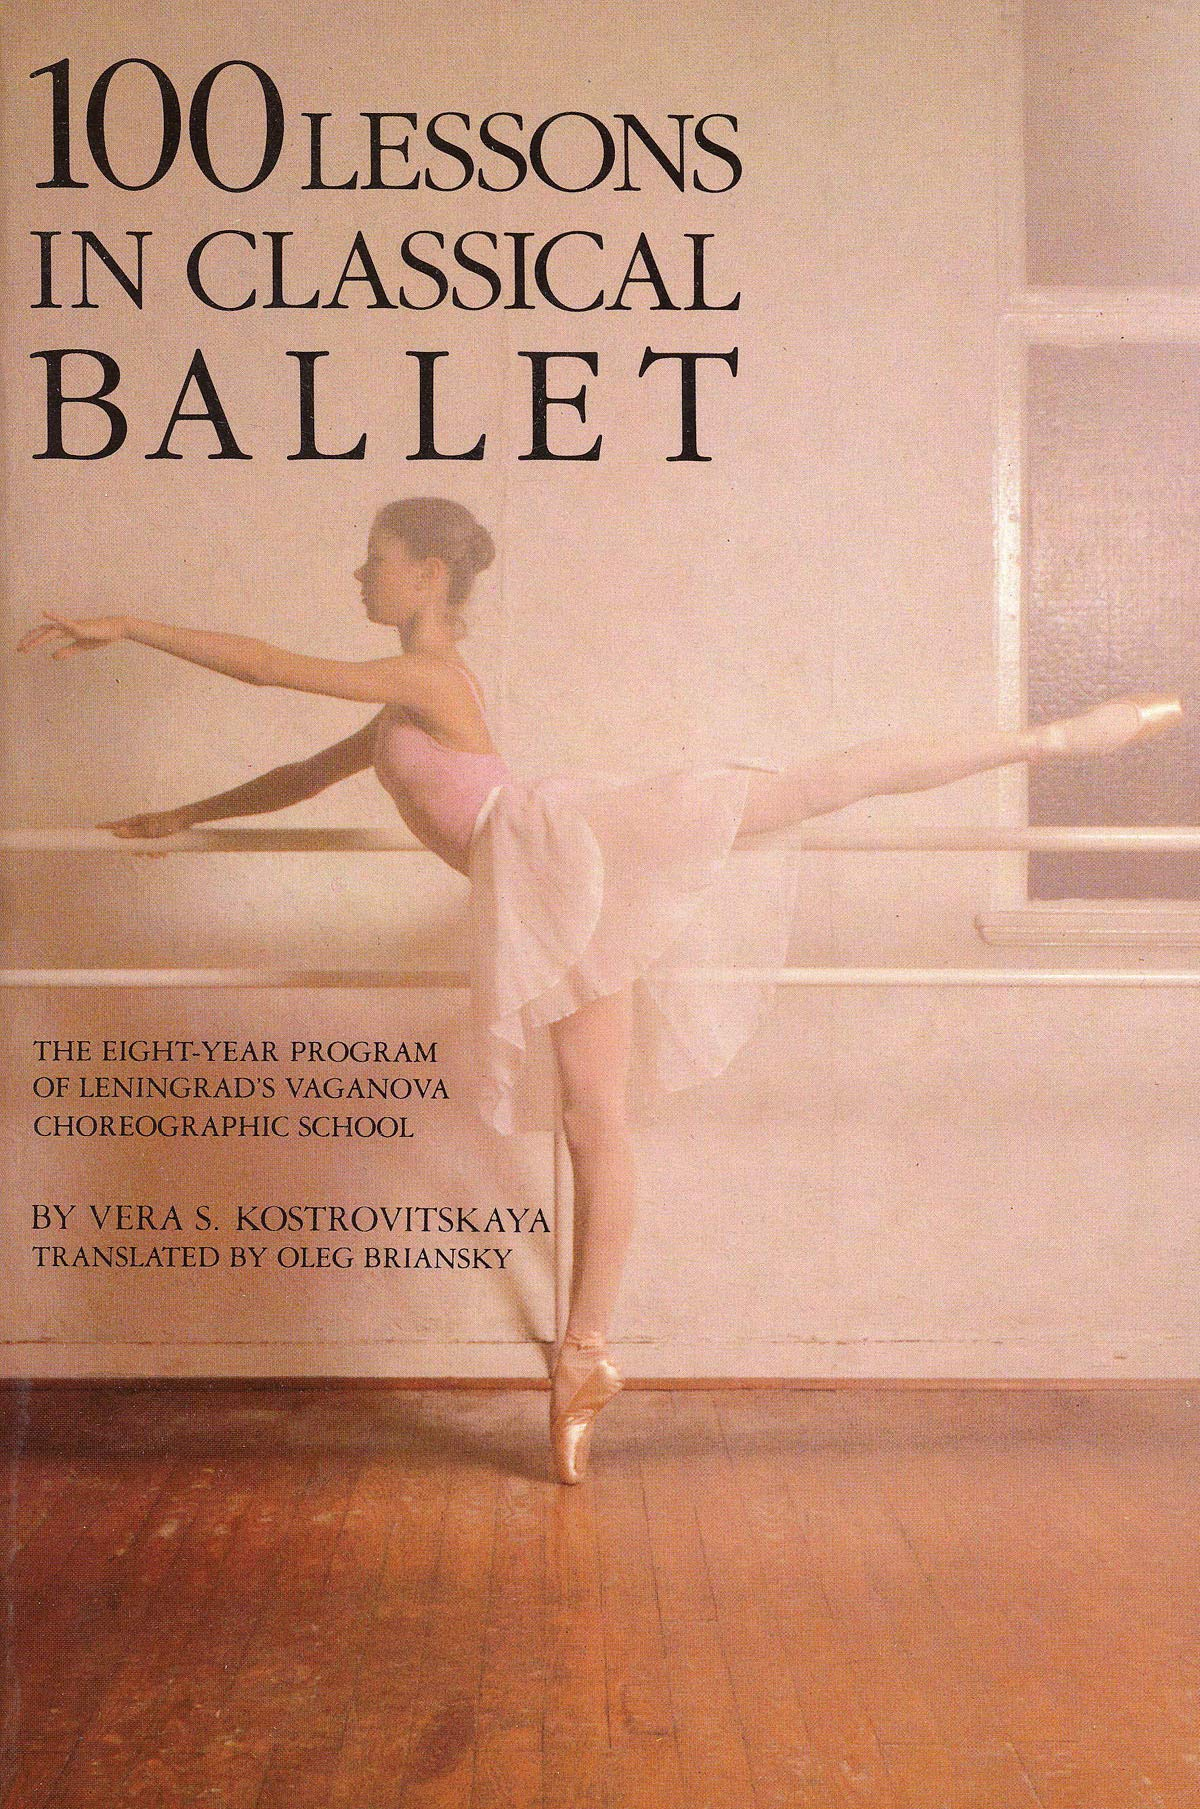 100 Lessons In Classical Ballet  The Eight Year Program Of Leningrad's Vaganova Choreographic School  Eight Year Programme Of Leningrad's Vaganova Choreographic School  Limelight